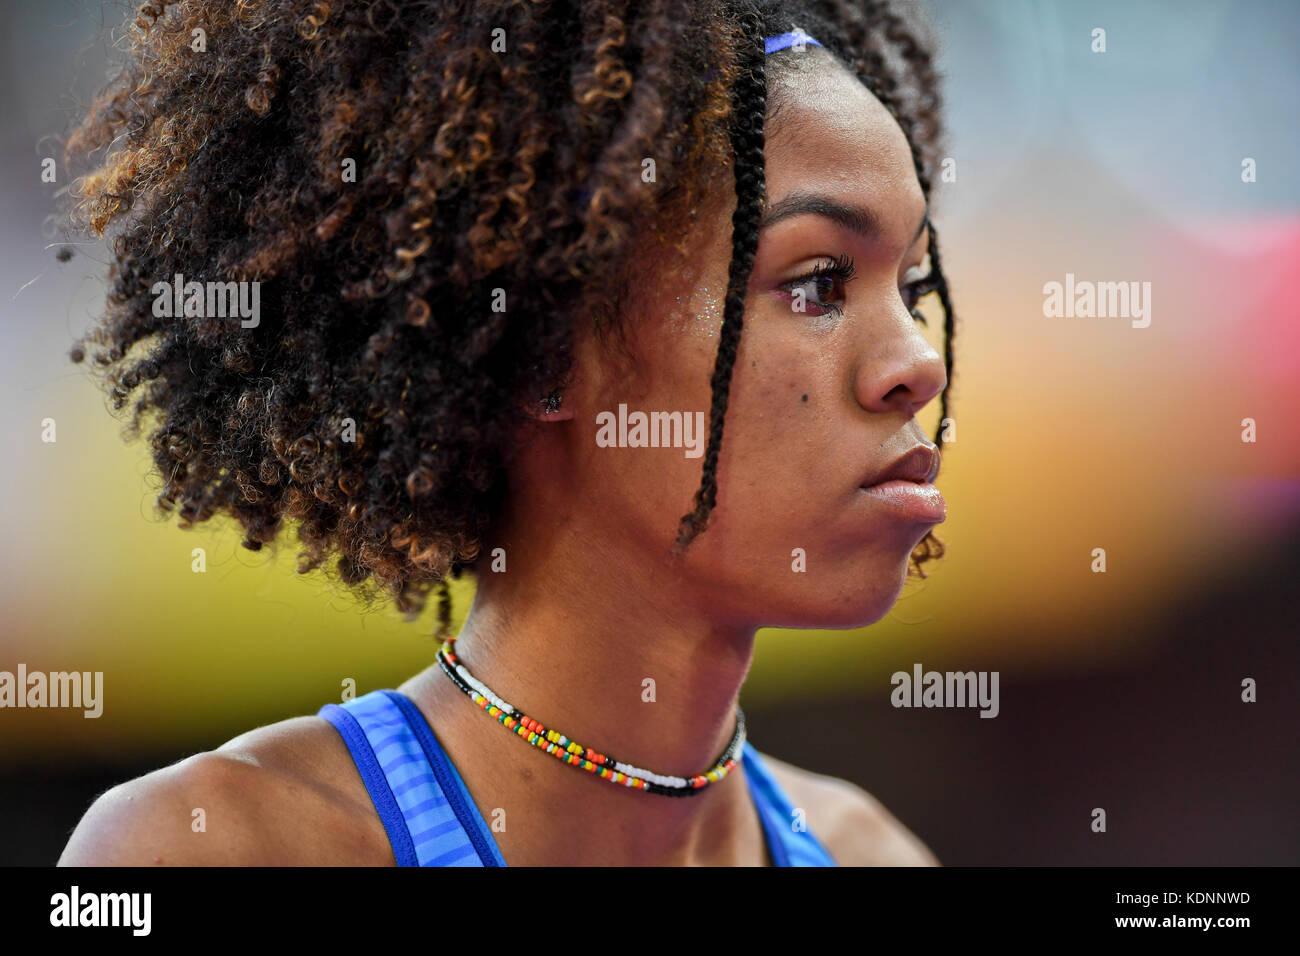 Vashti Cunningham - High Jump - IAAF World Championships London 2017 - Stock Image